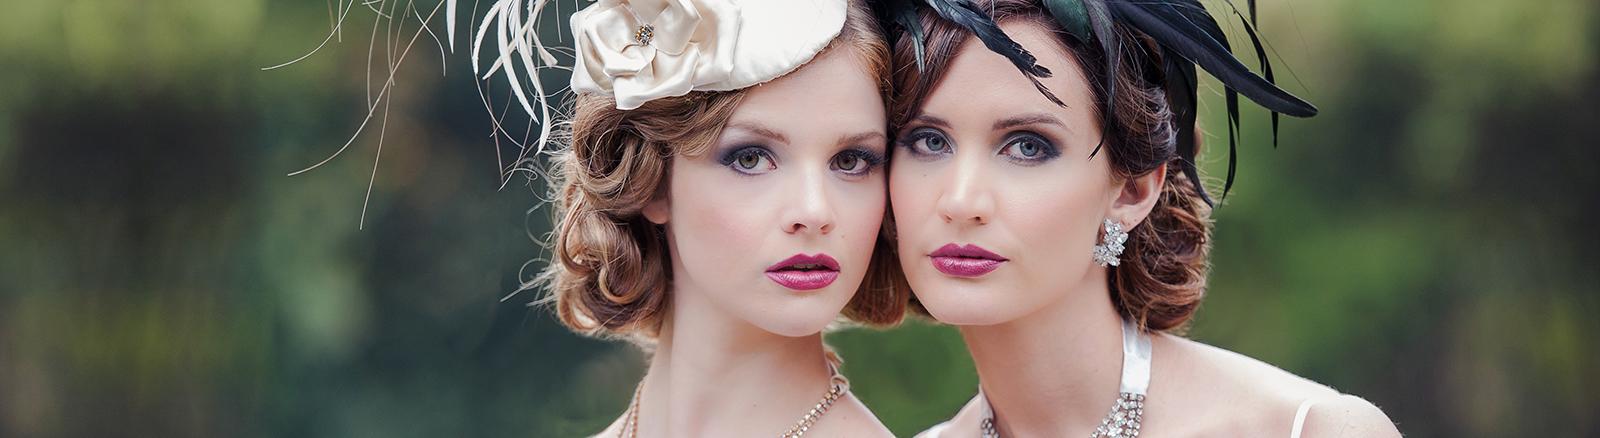 Gatbsy Inspired Glamour